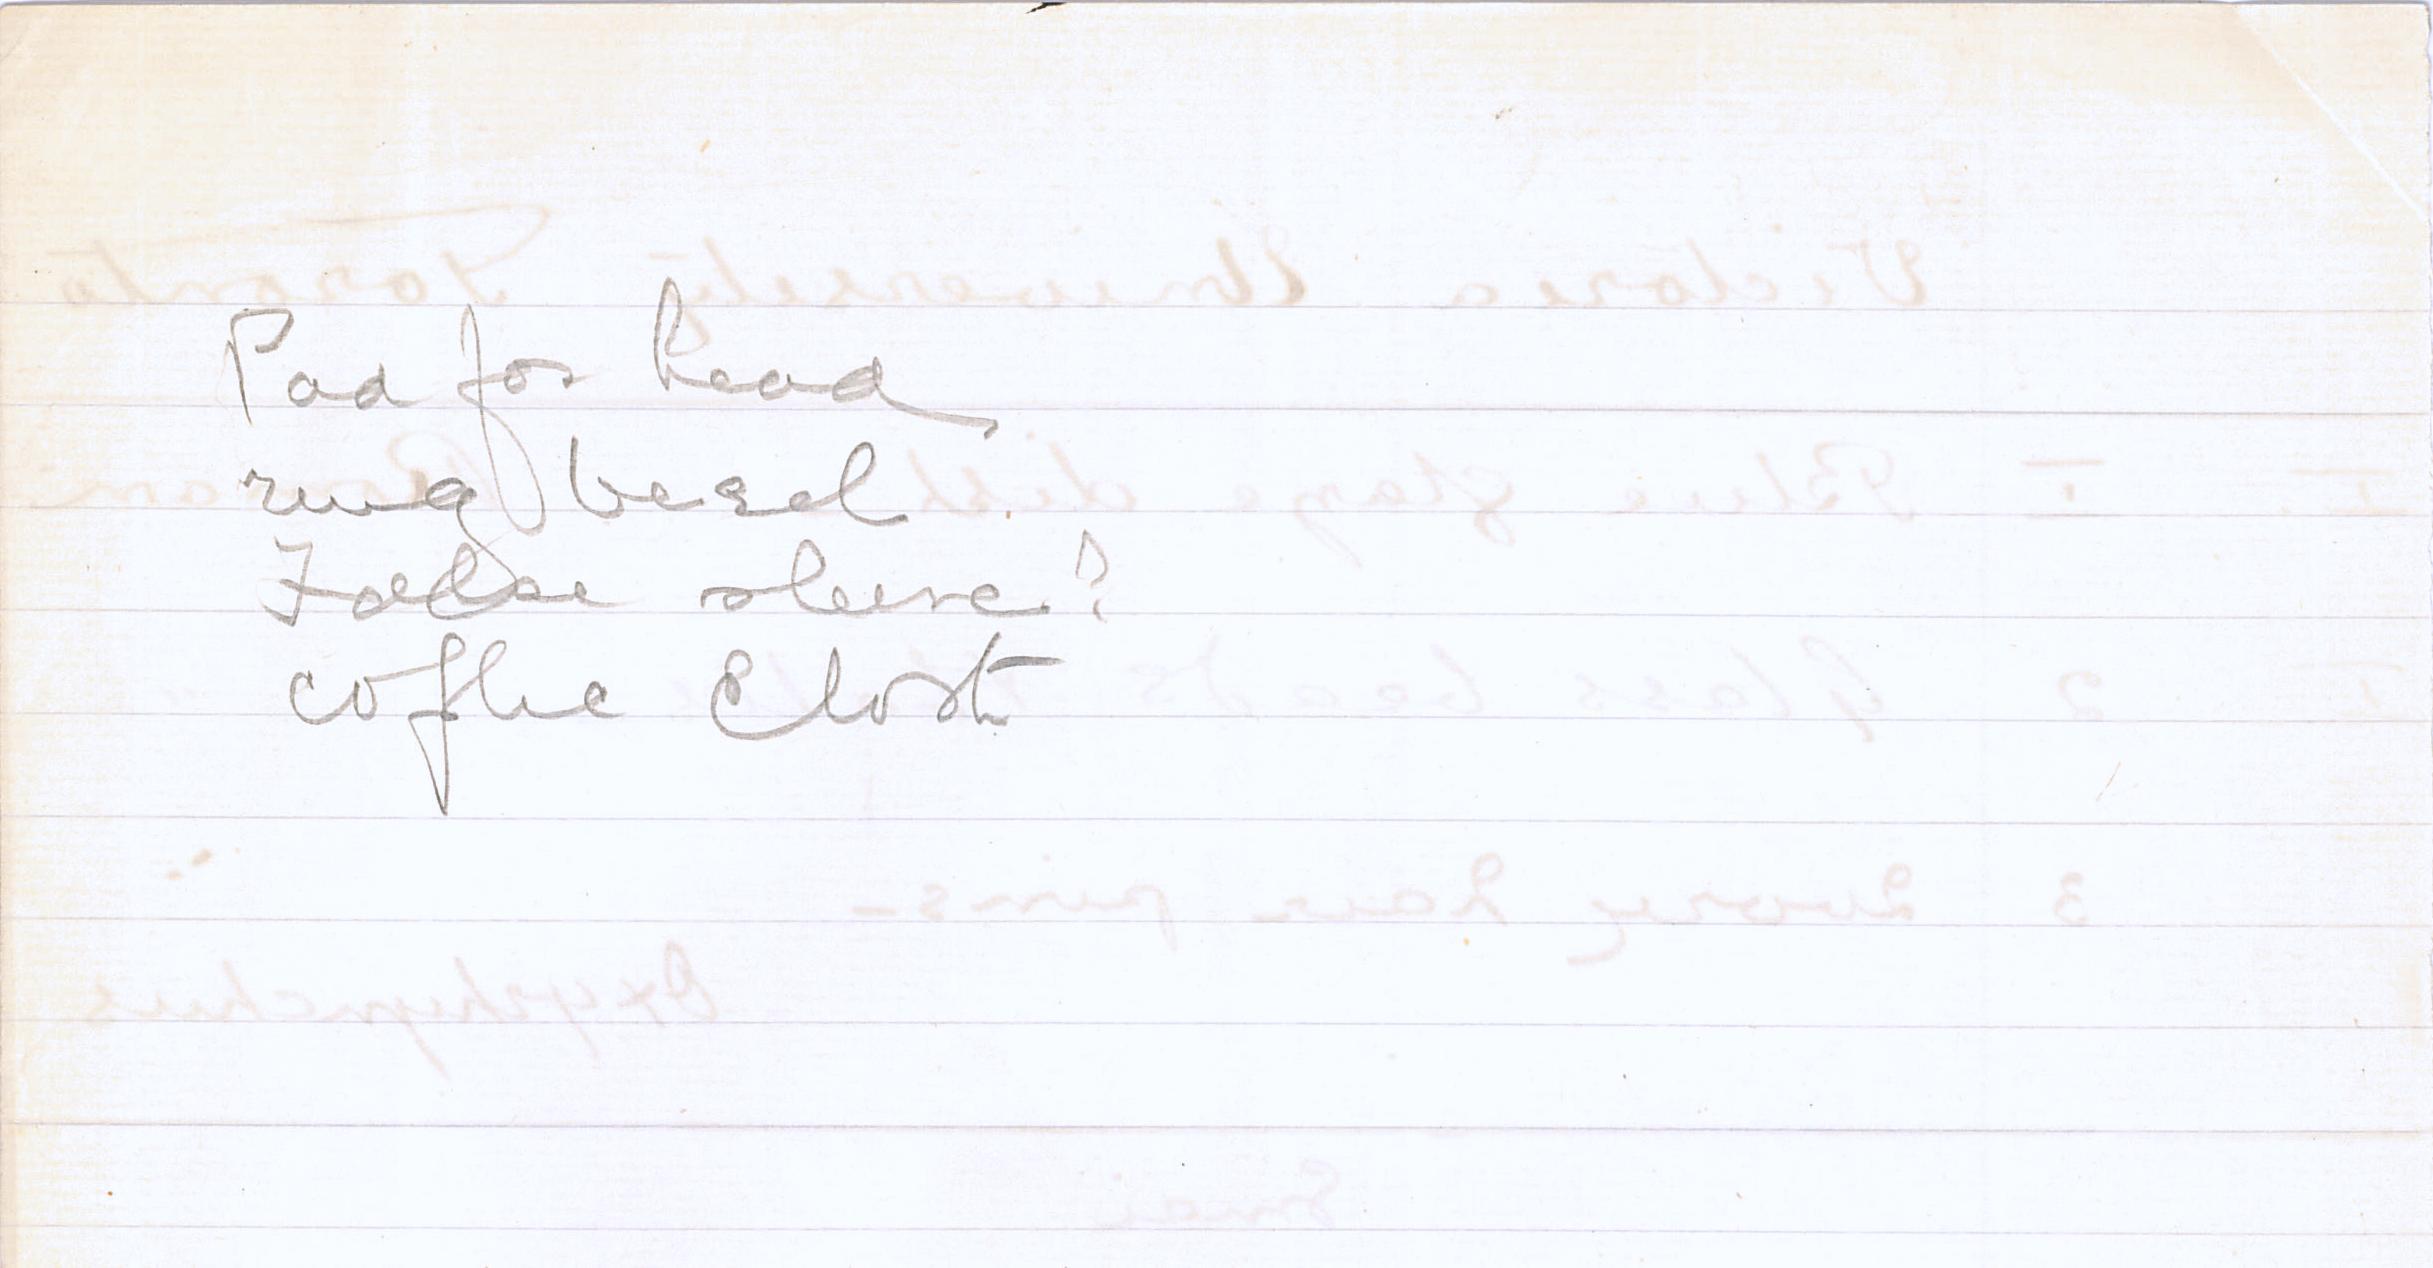 1904-05 Deir el-Bahri, Sinai, Oxyrhynchus DIST.24.56s